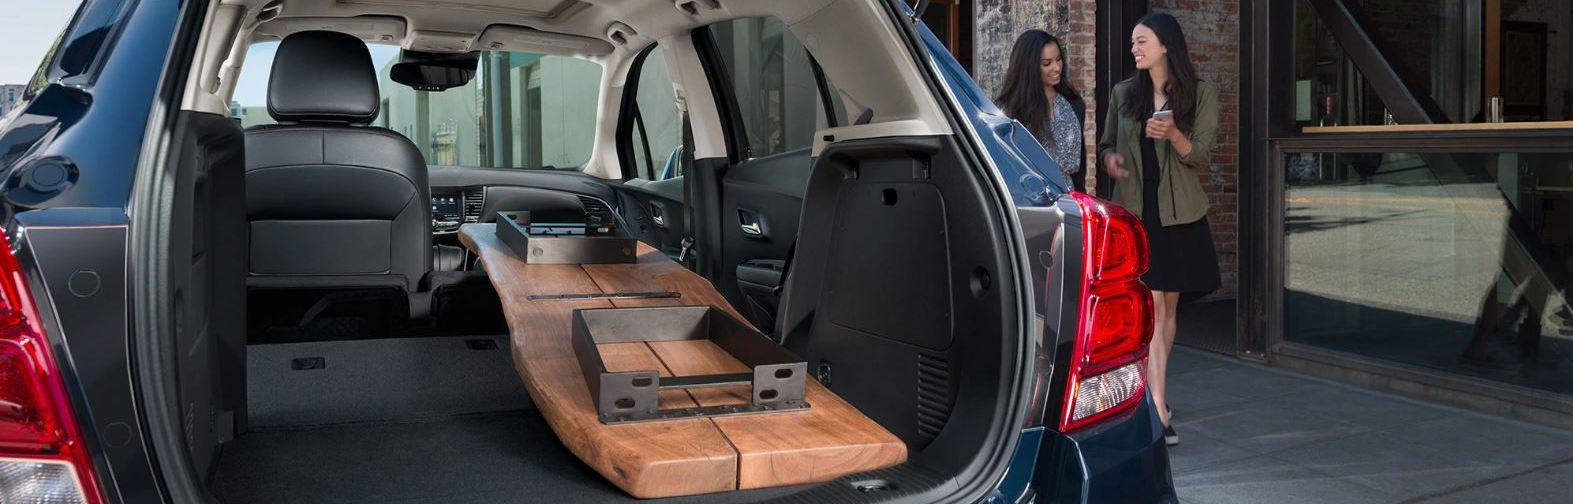 2020 Chevrolet Trax Storage Area